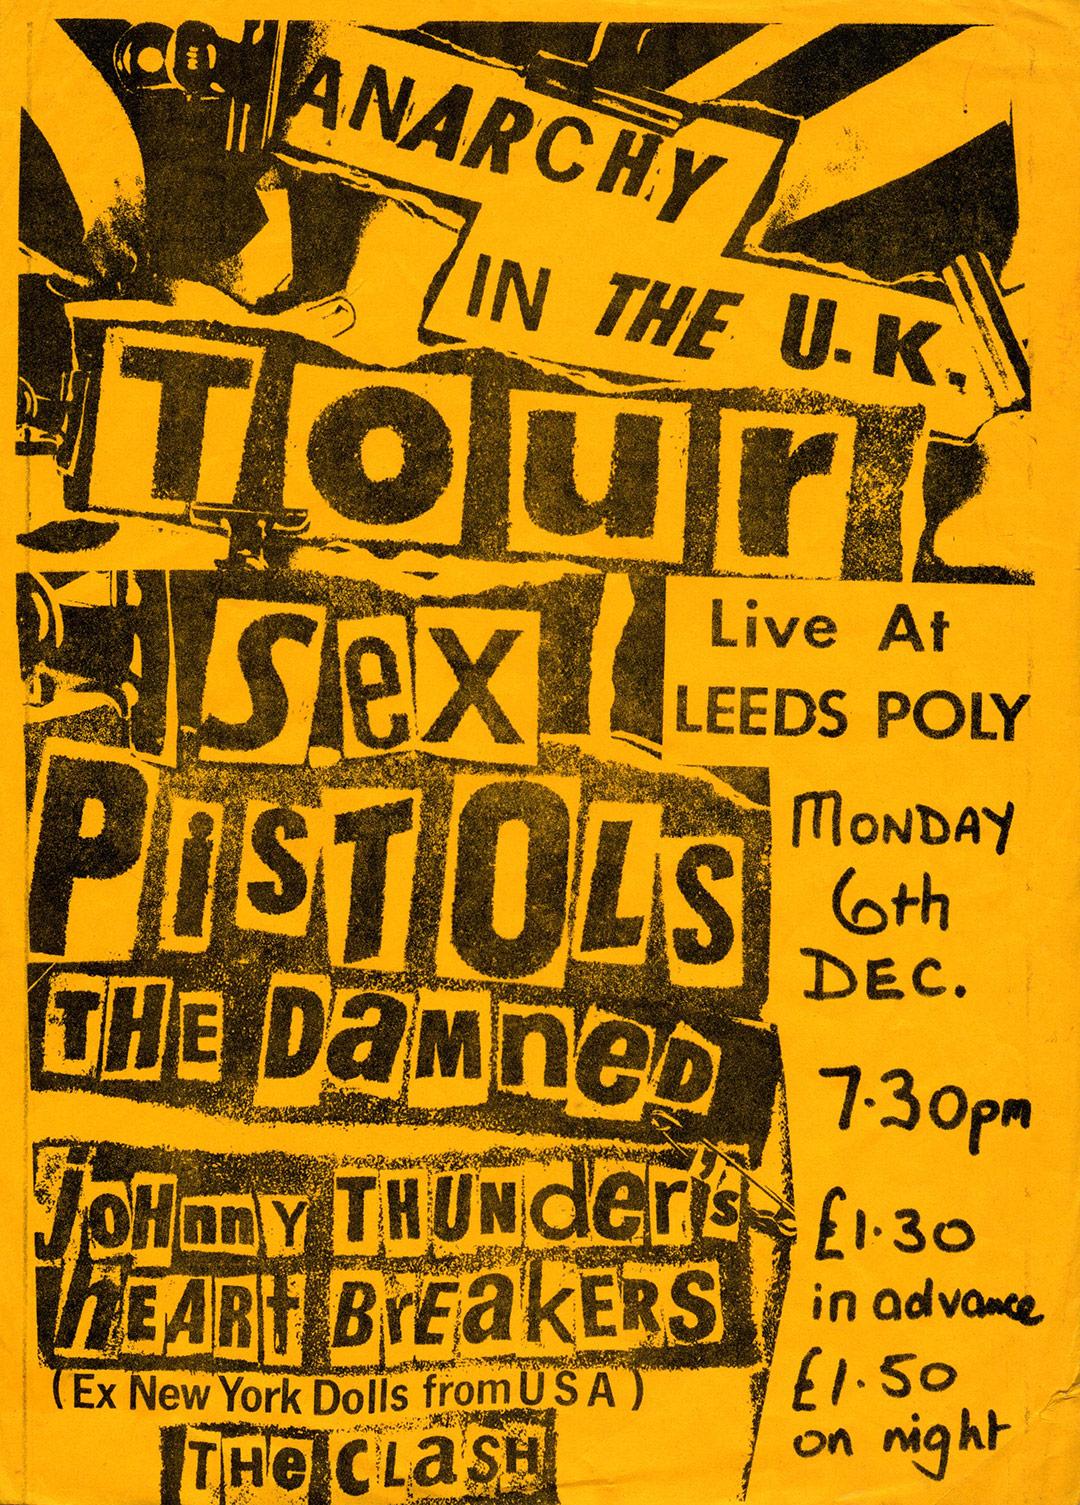 Leeds Polytechnic, Leeds, December 6th 1976 - Poster